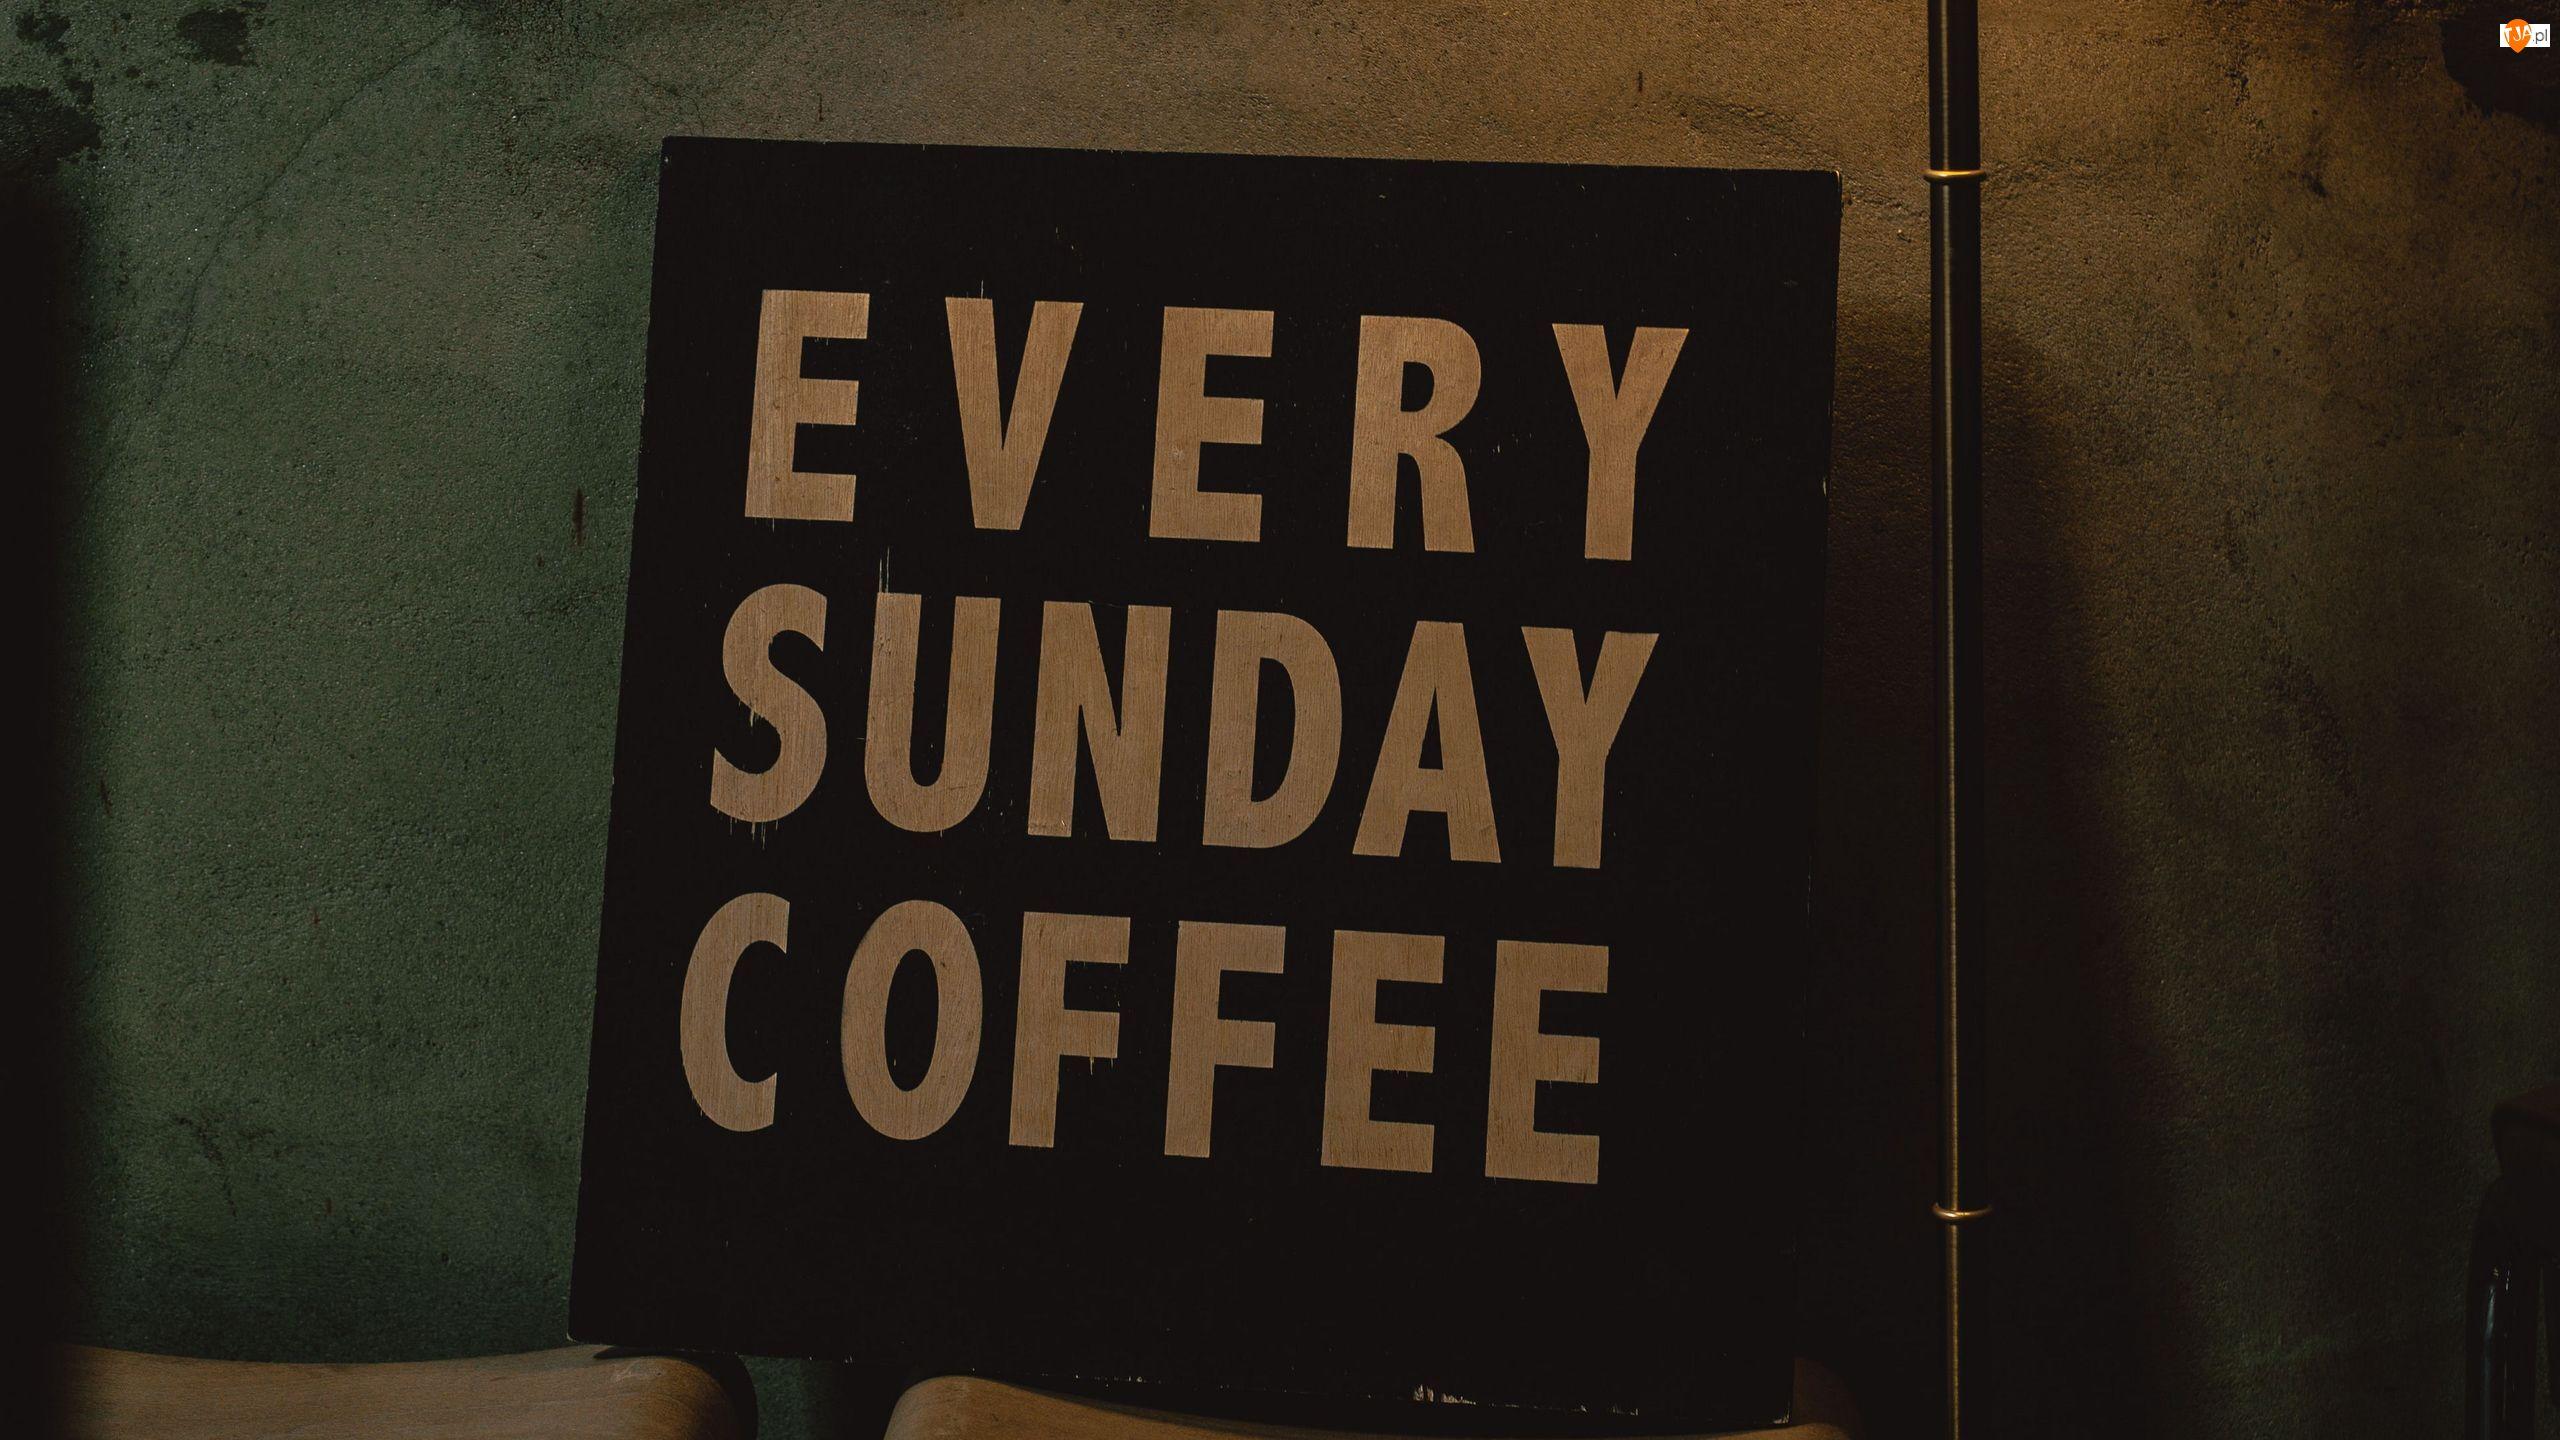 Every Sunday Coffee, Napis, Tabliczka, Tekst